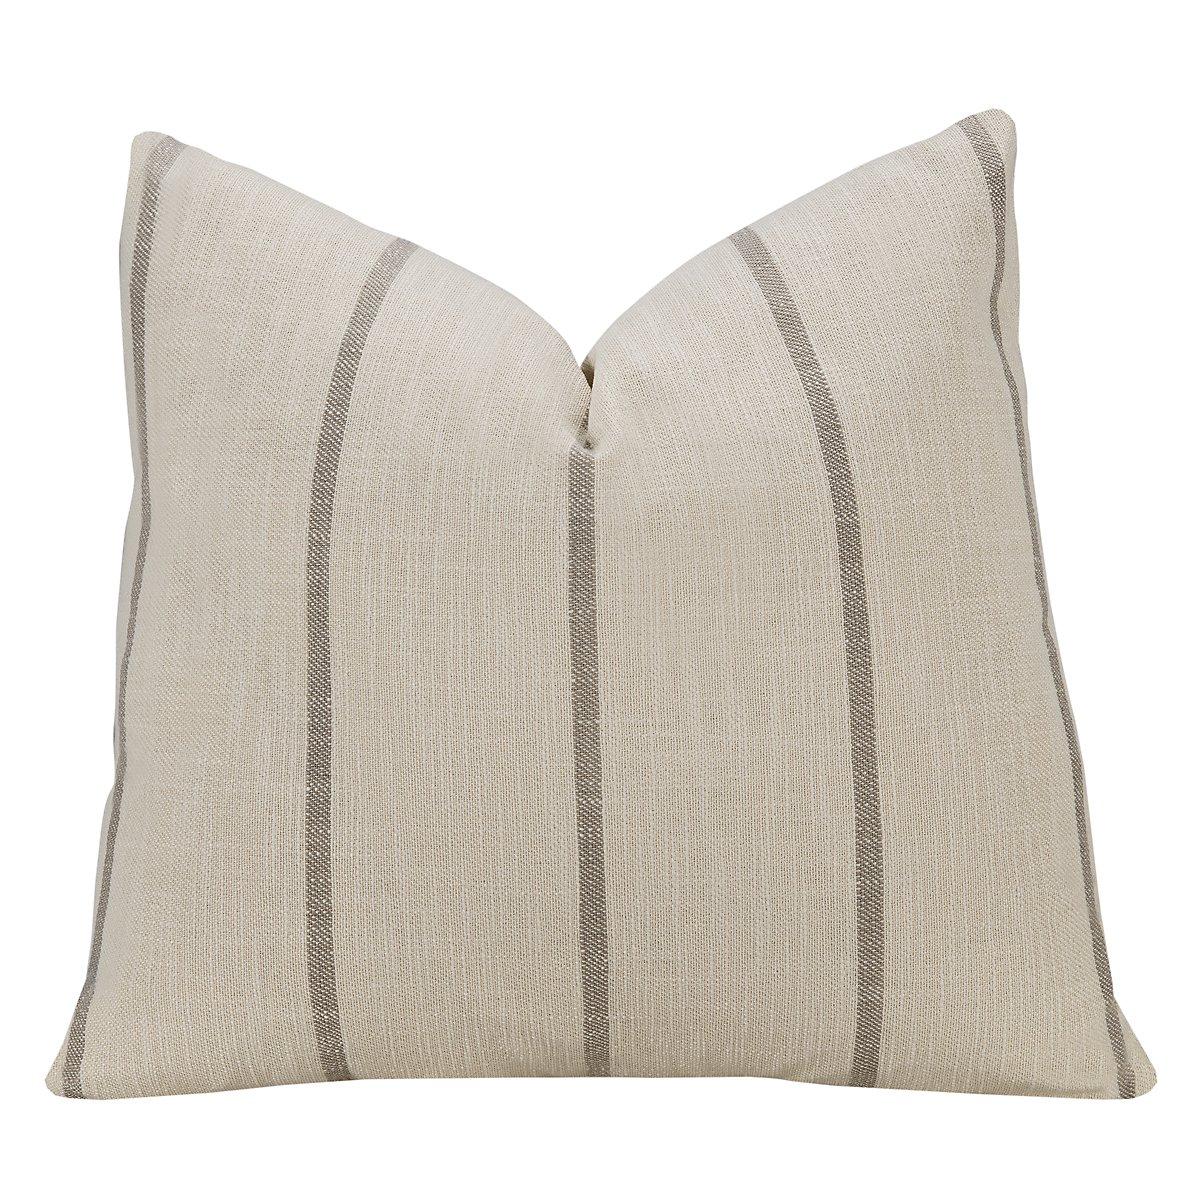 Bellevue Stripe Fabric Square Accent Pillow